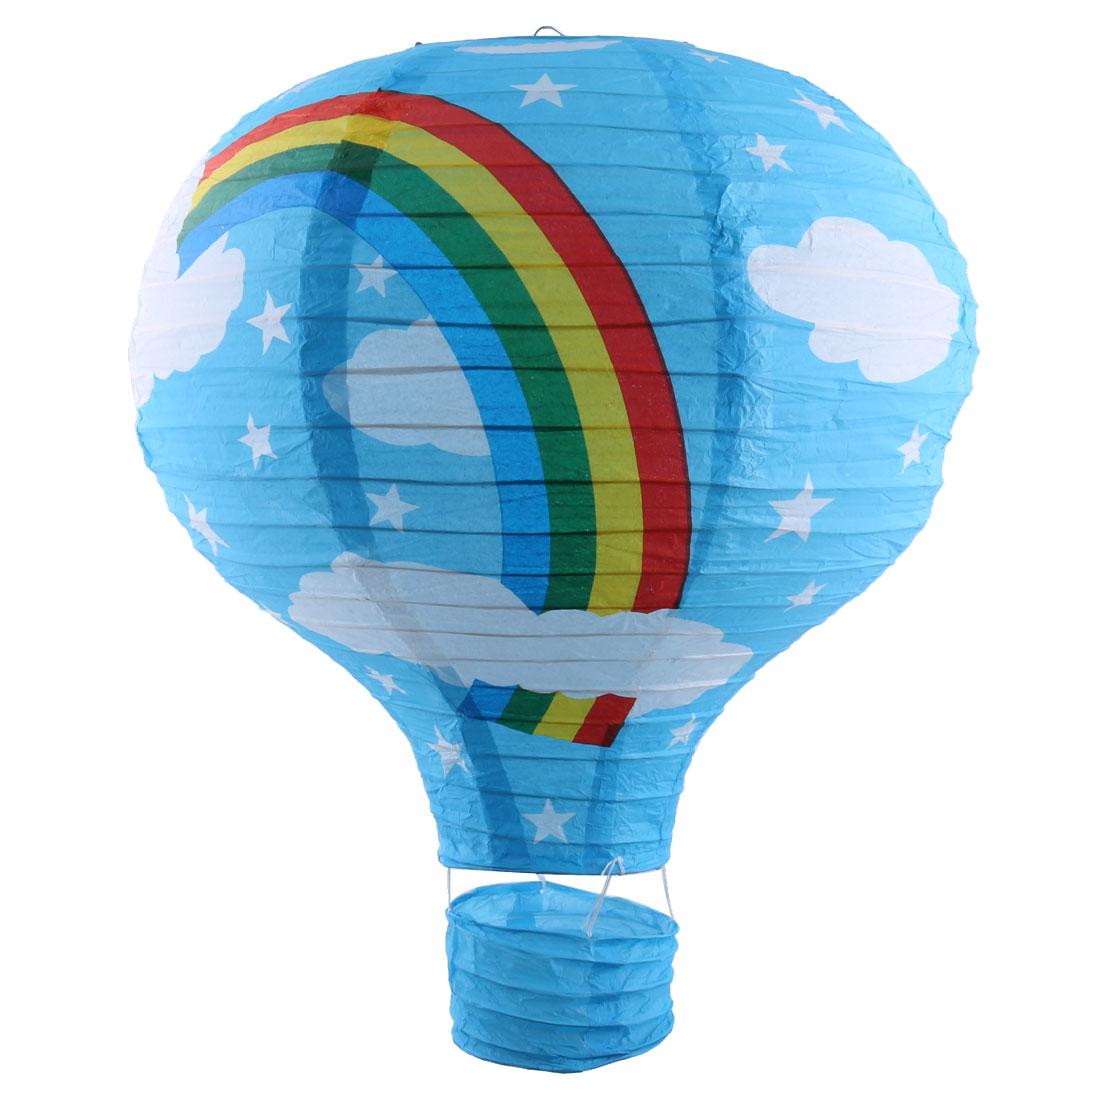 Wedding Festival Paper Rainbow Pattern DIY Decorative Lightless Hanging Hot Air Balloon Lantern Blue